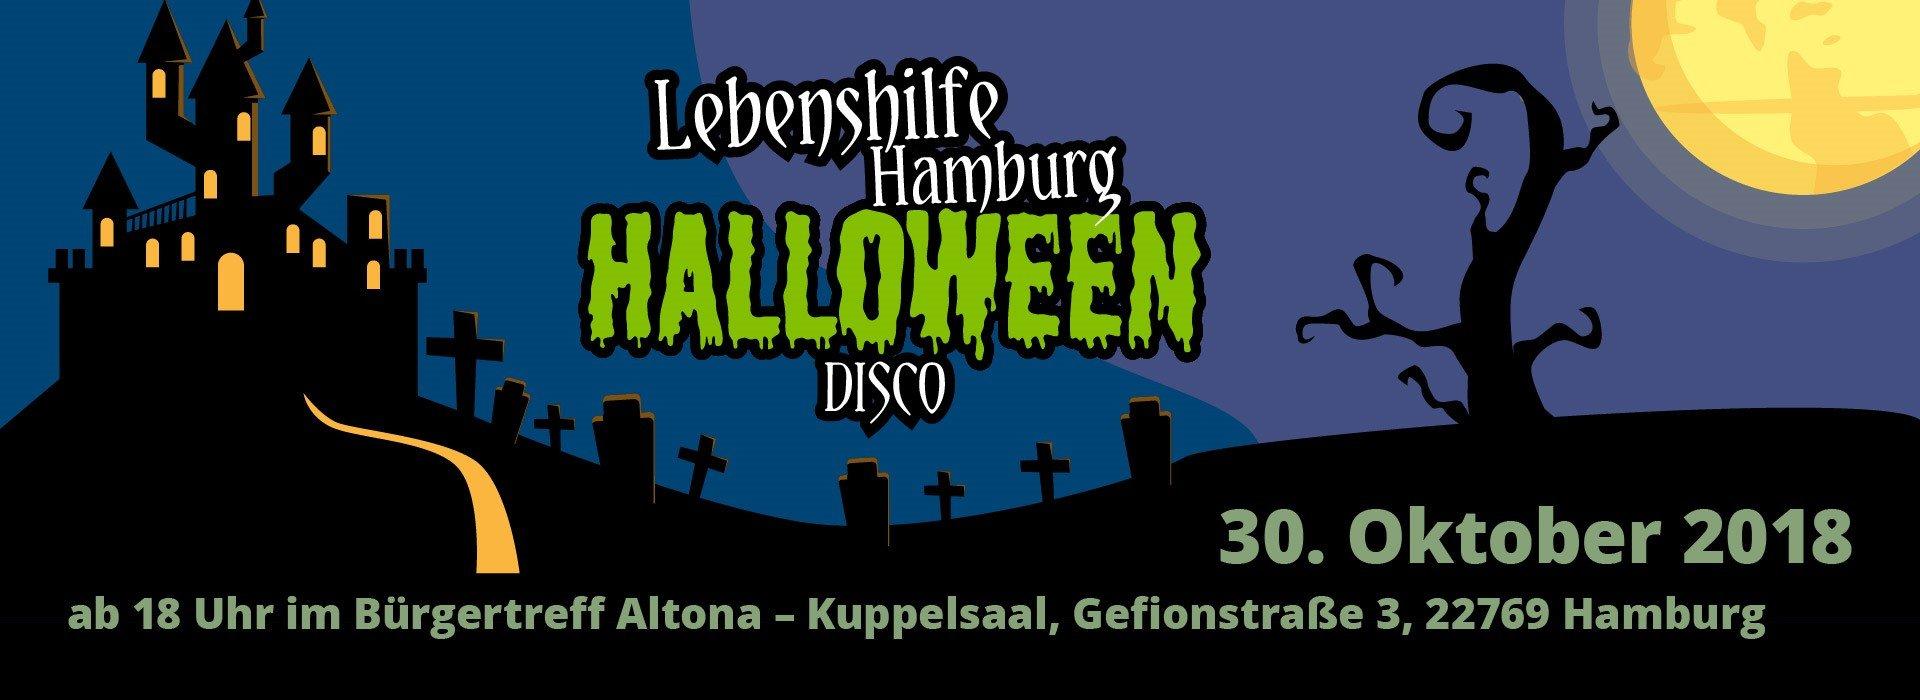 Flyer Halloween-Disco: Lebenshilfe Hamburg Halloween-Disco, 30. Oktober 2018, ab18 Uhr im Bürgertreff Altona - Kuppelsaal, Gefionstr. 3, 22769 Hamburg